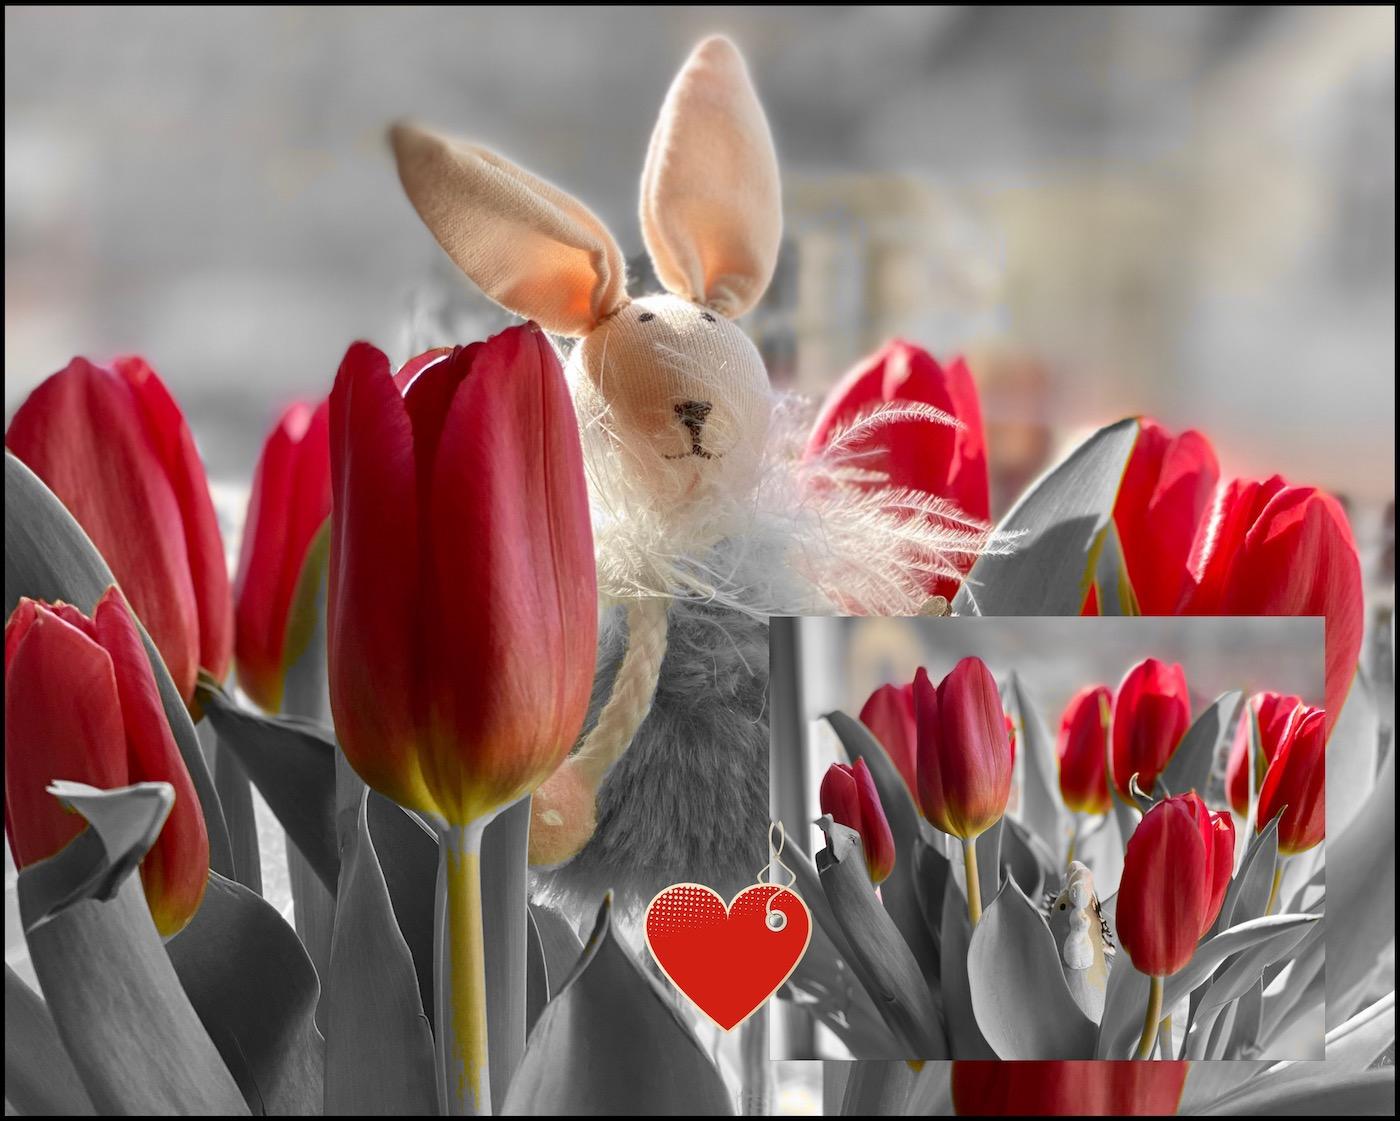 Wir lieben Tulpen